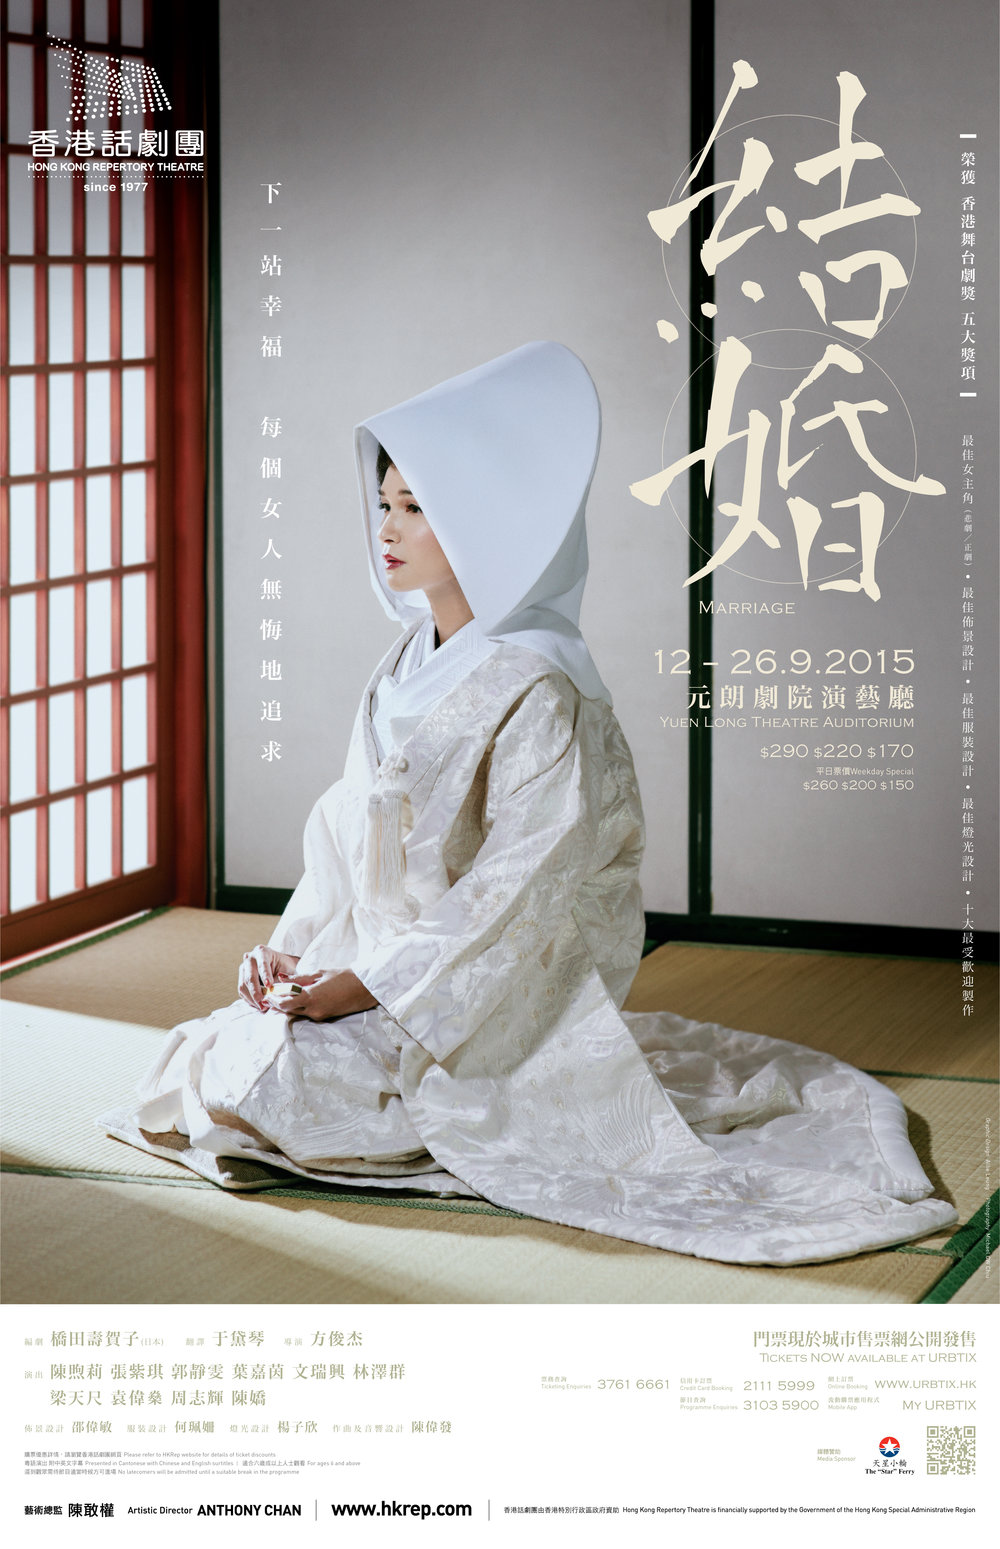 HKREP 'Marriage' (結婚) Rerun Poster. Hong Kong. 2018